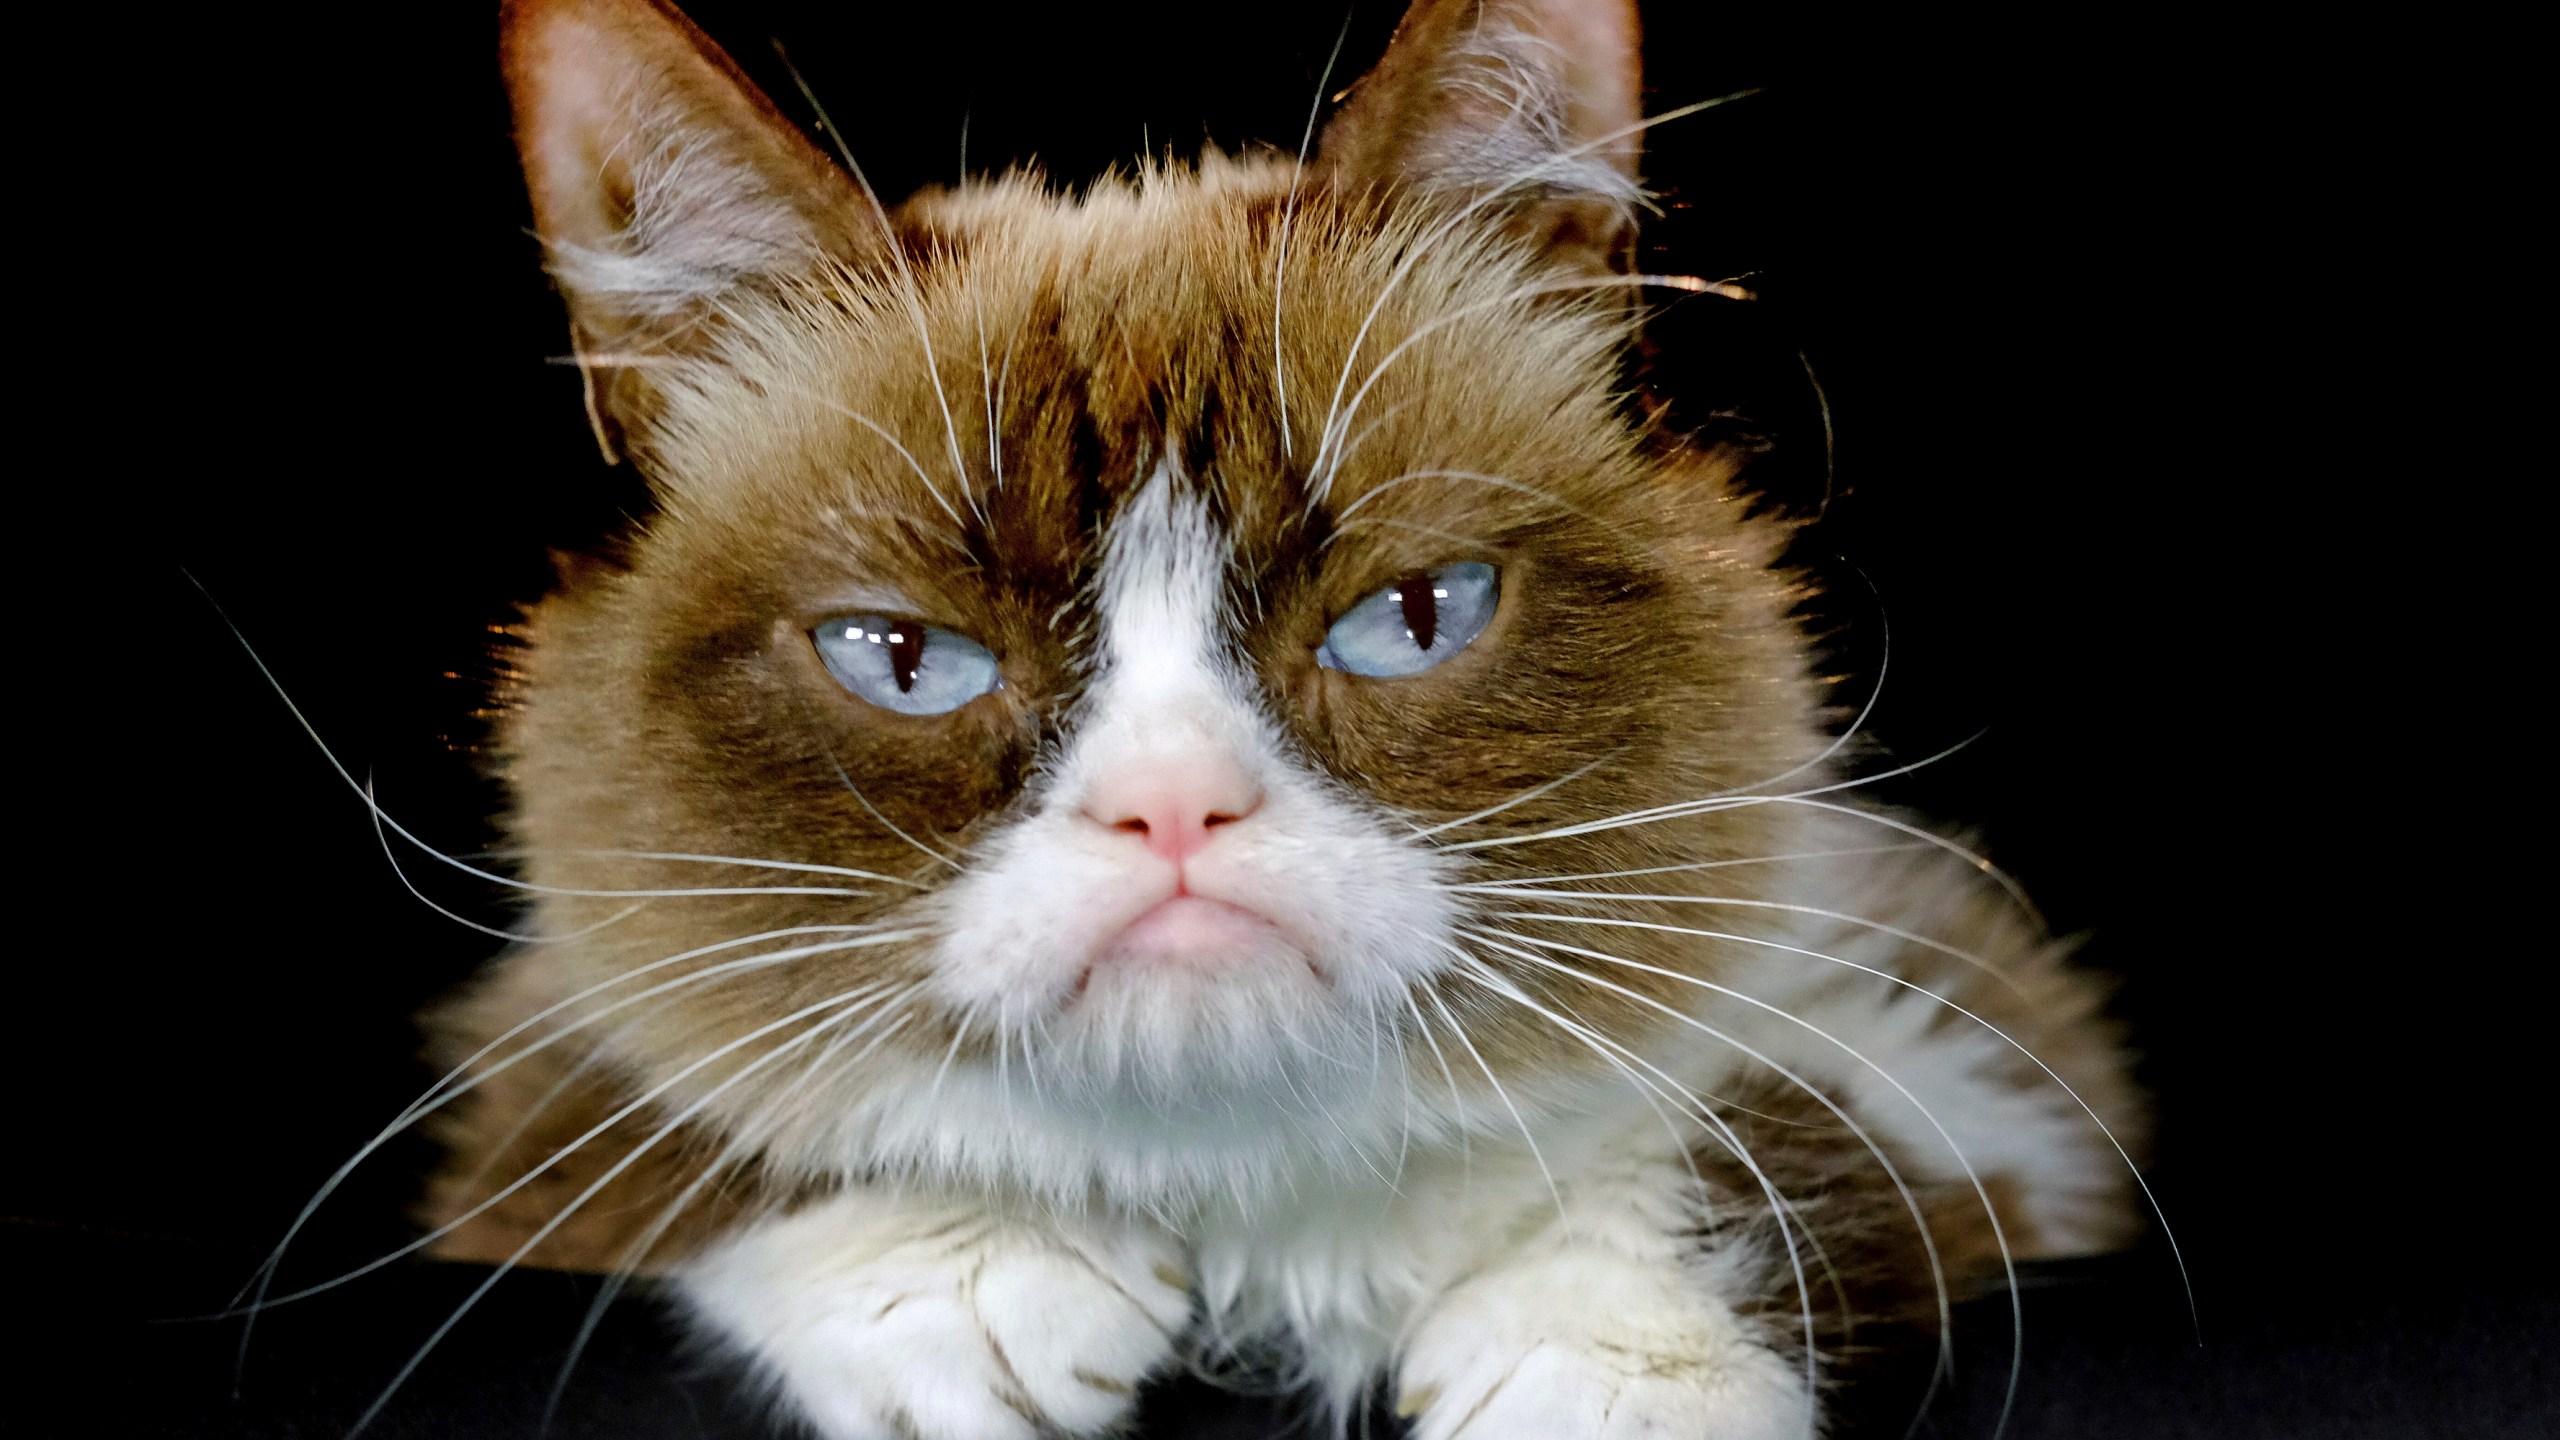 Grumpy_Cat_Death_23718-159532.jpg76700622